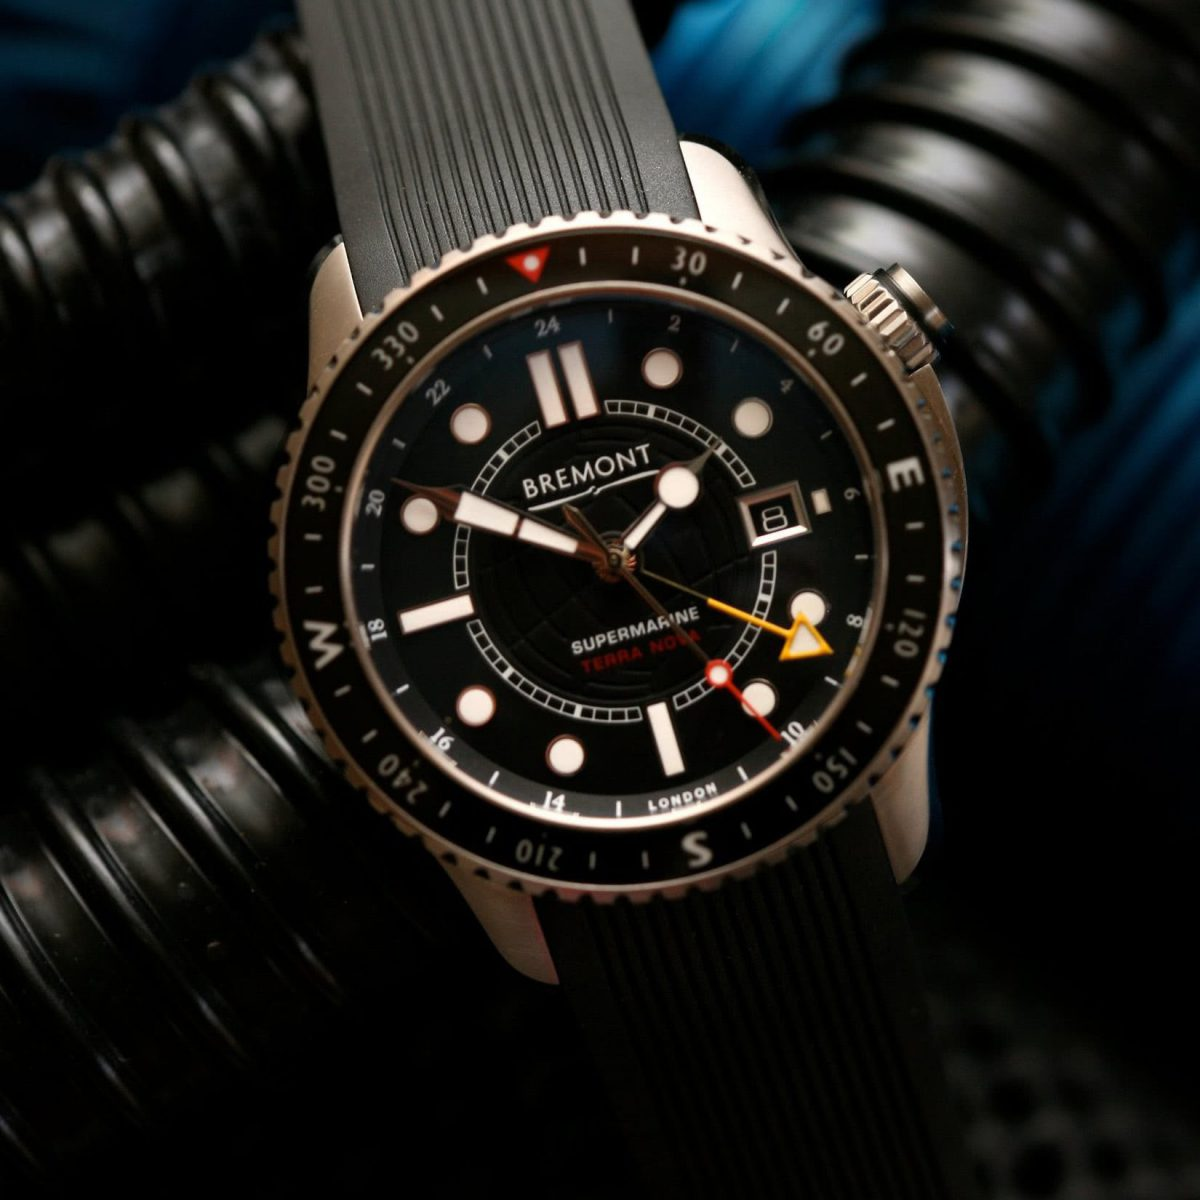 watch materials titanium - Luxe Digital